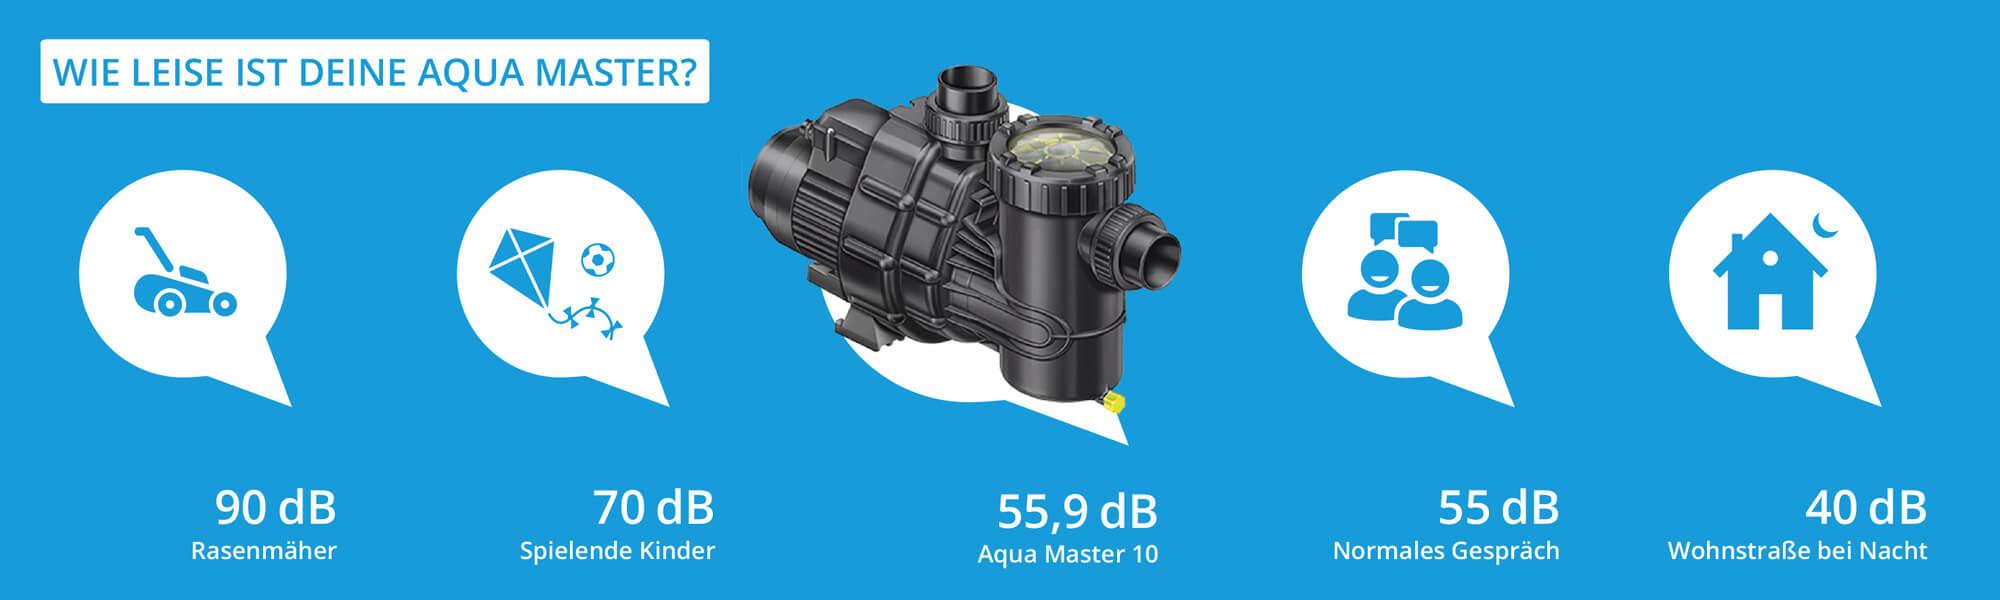 Geräuschevergleich Aqua Master